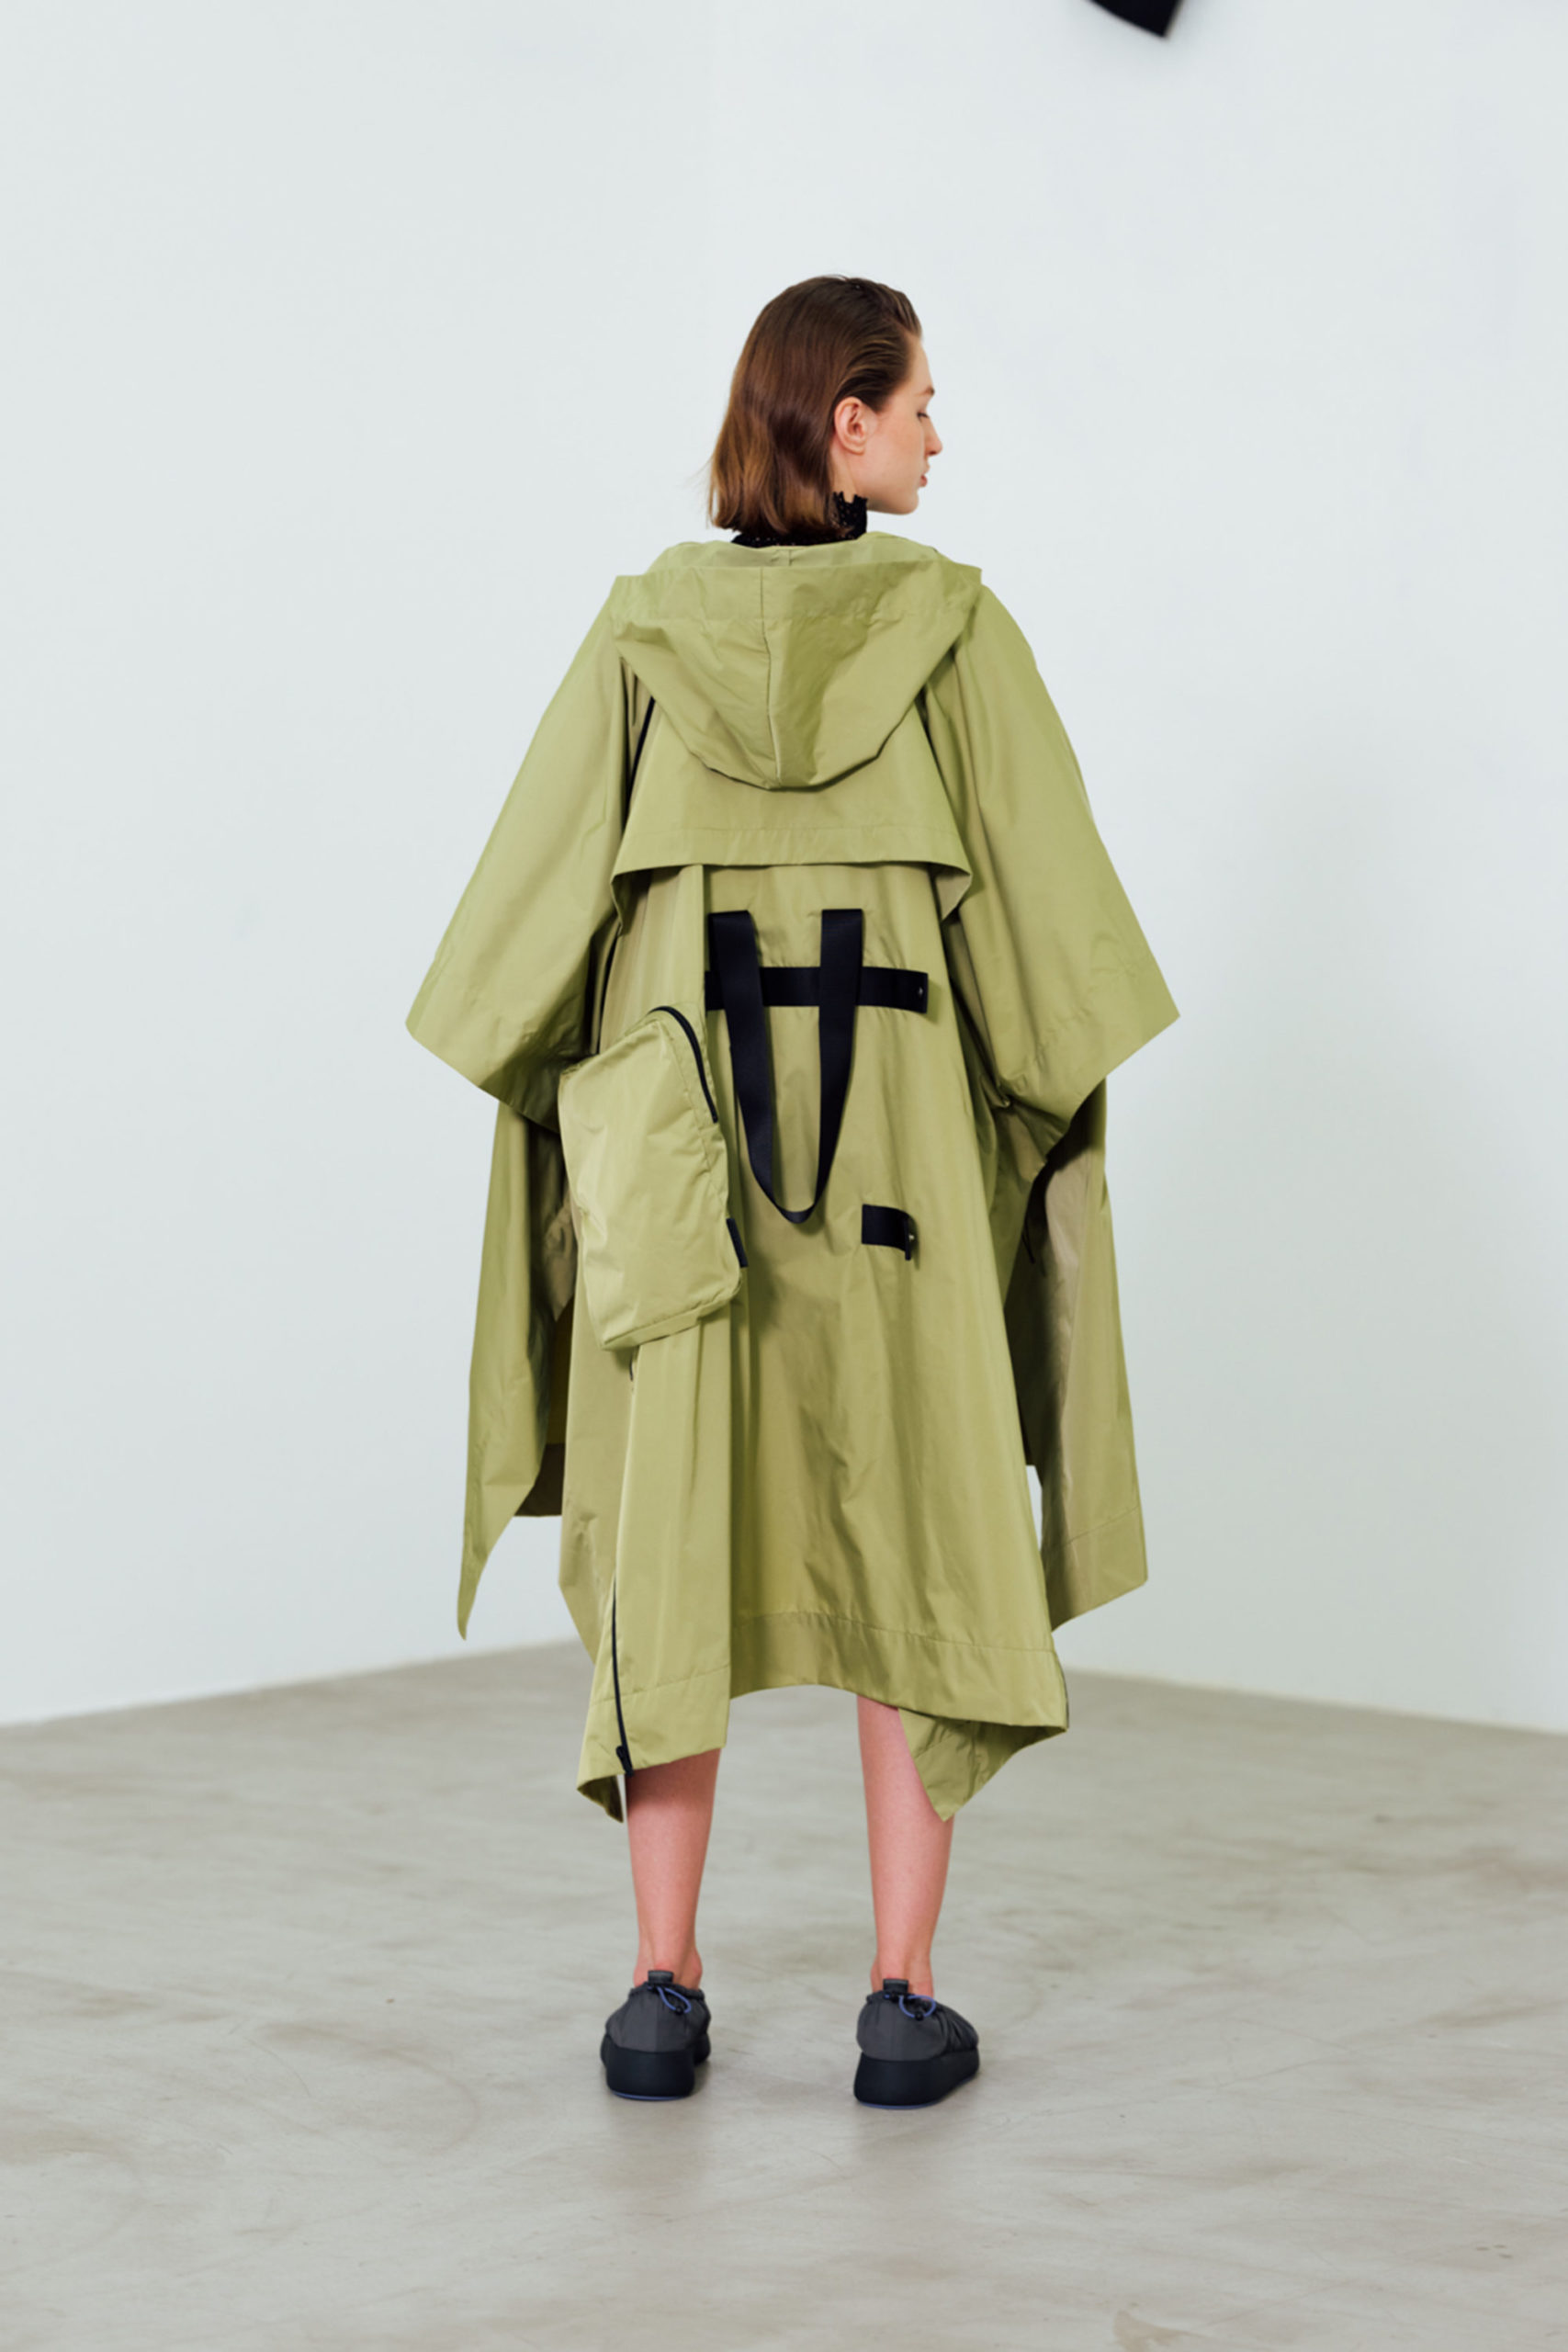 Ментоловый образ от Issey Miyake Ready To Wear весна-лето 2021